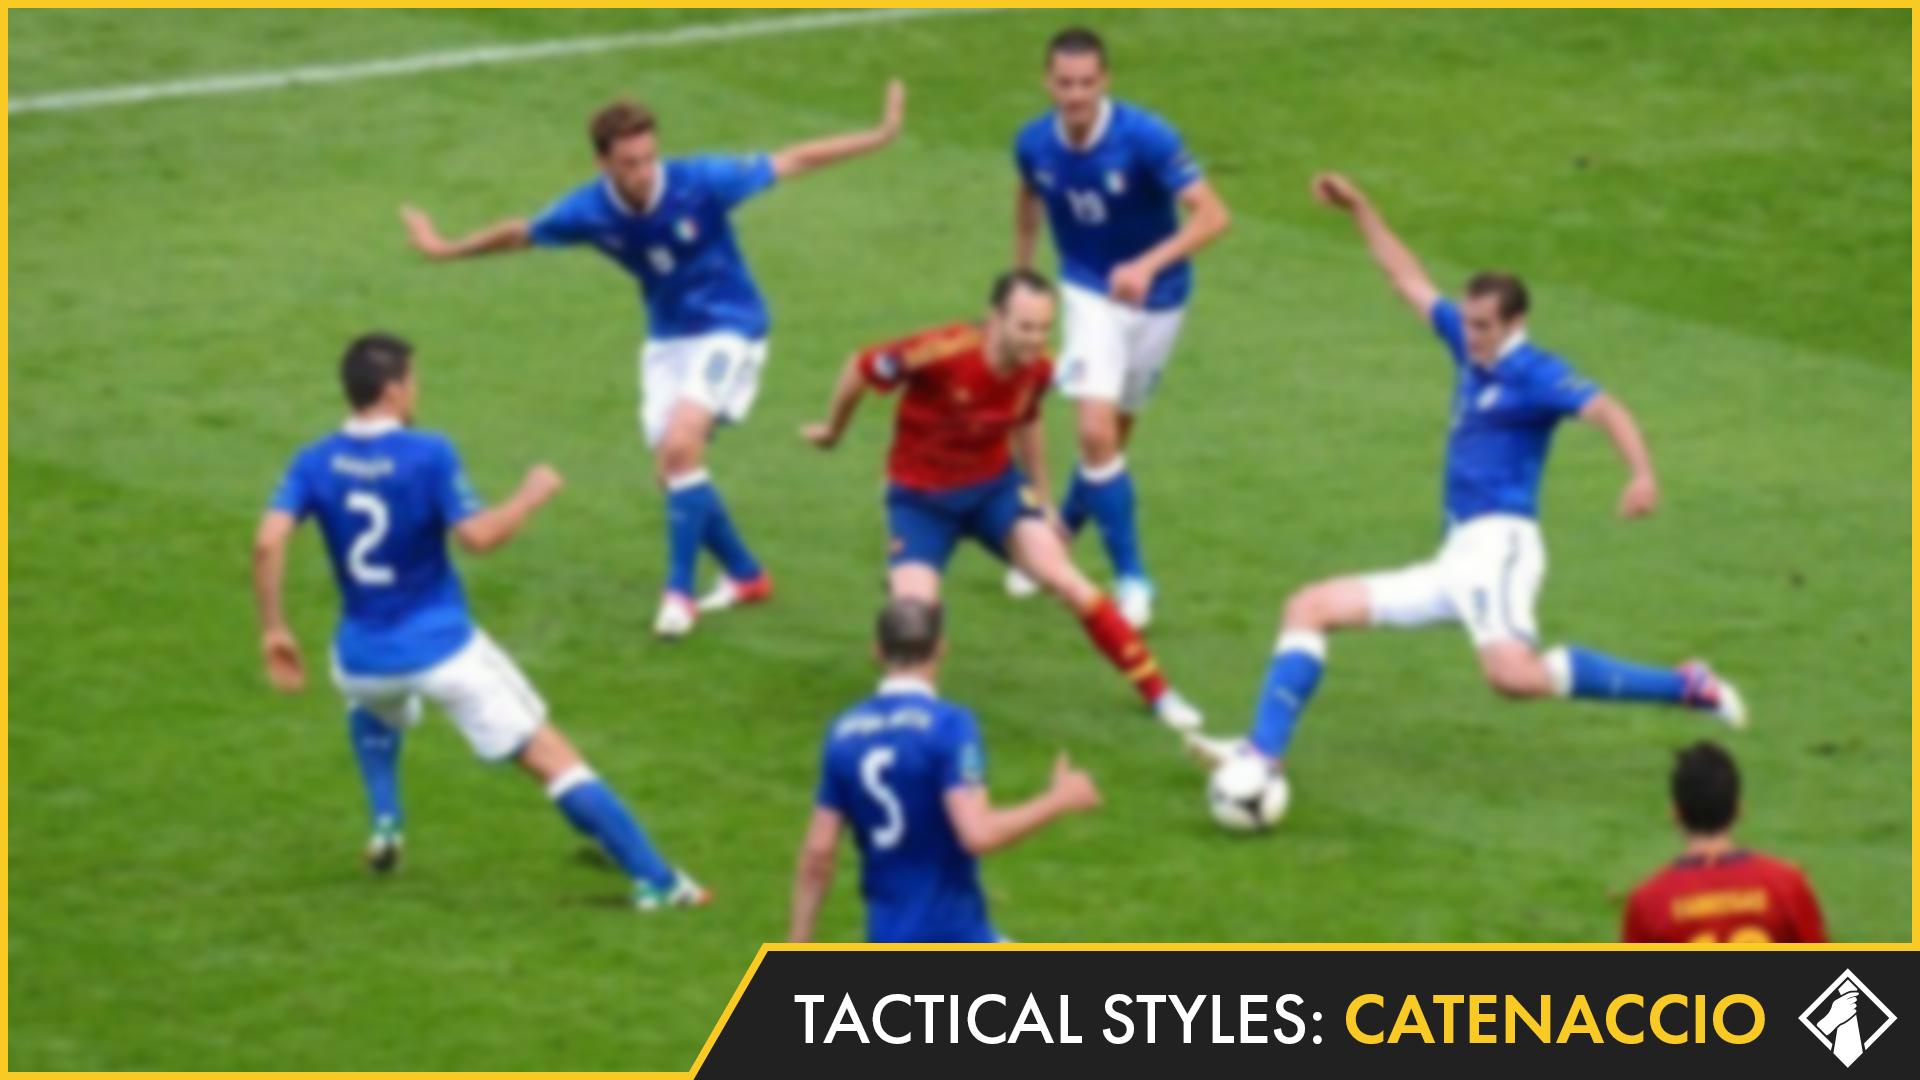 """FM21 - Tactical Styles: Catenaccio"" feature image"